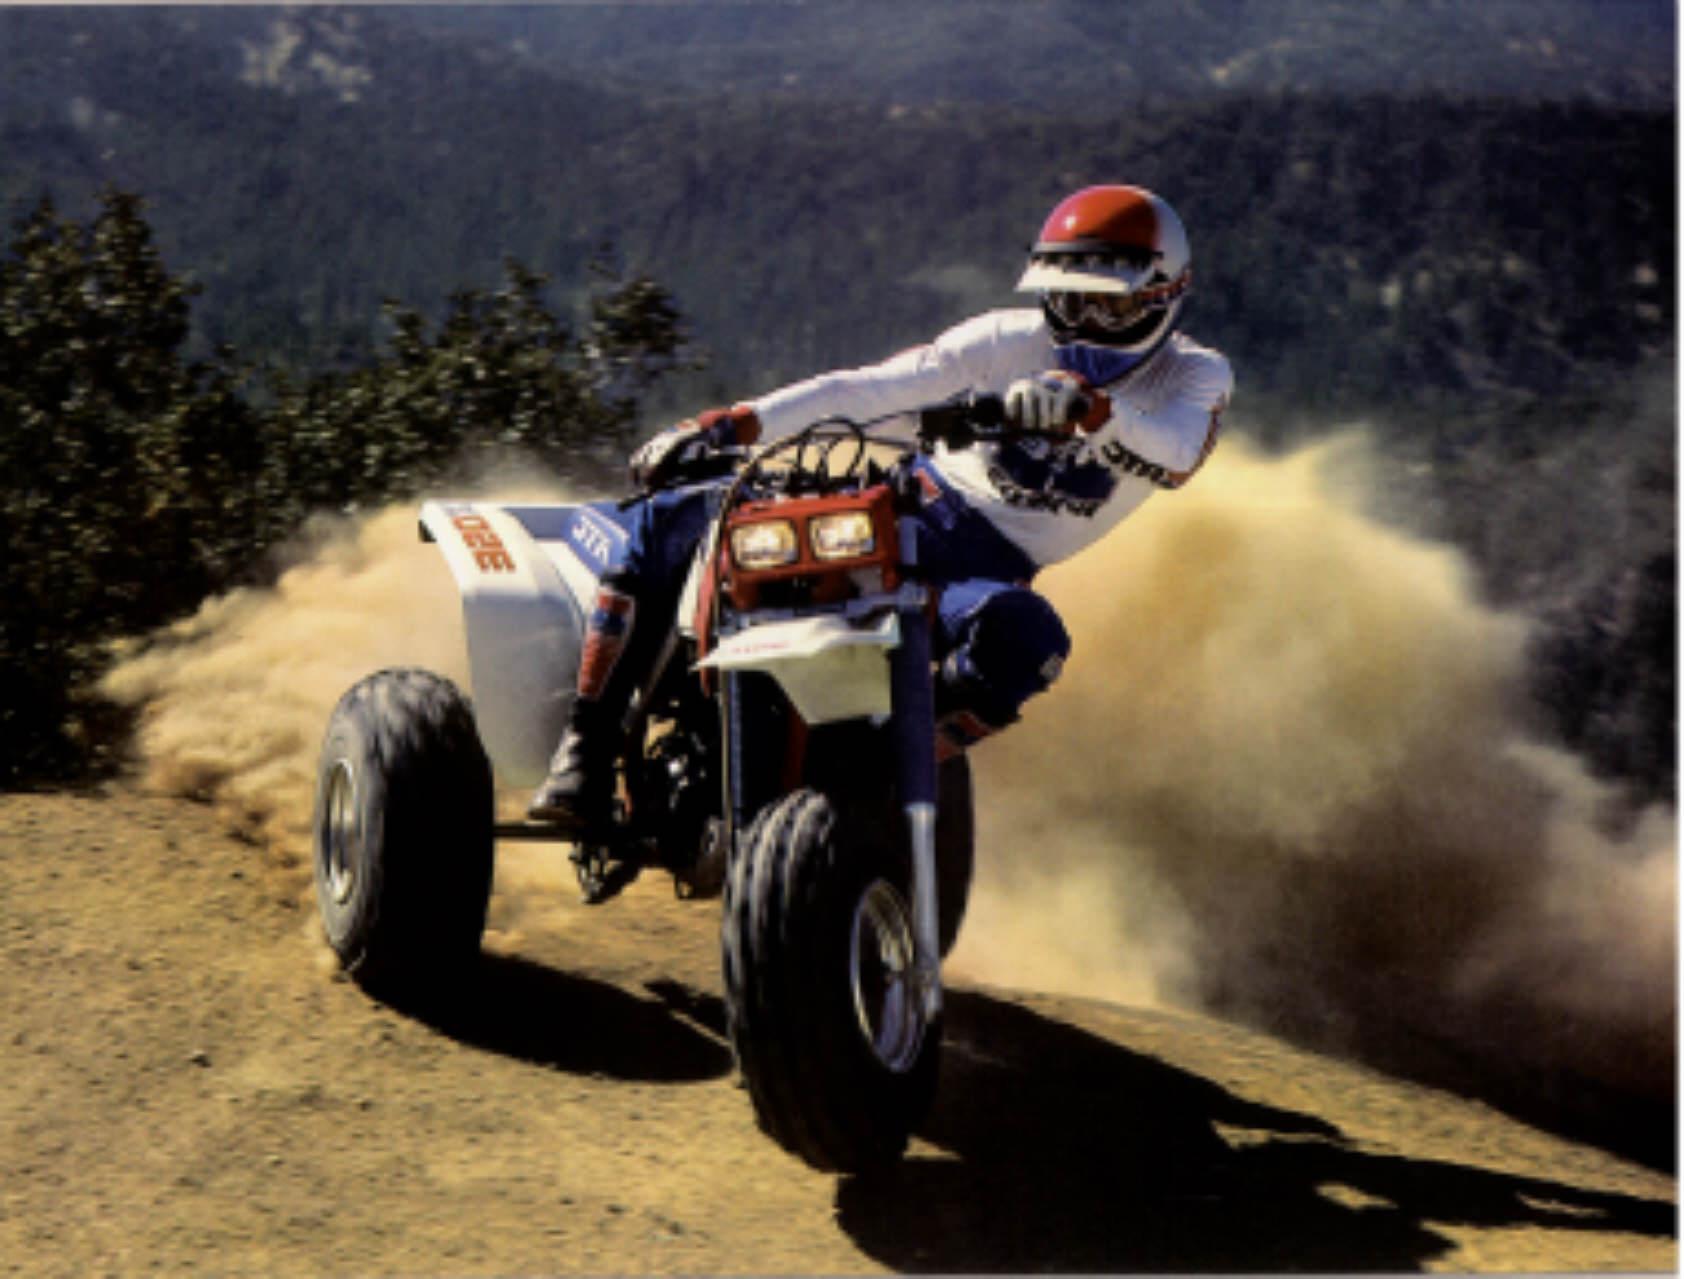 motorsports1 image